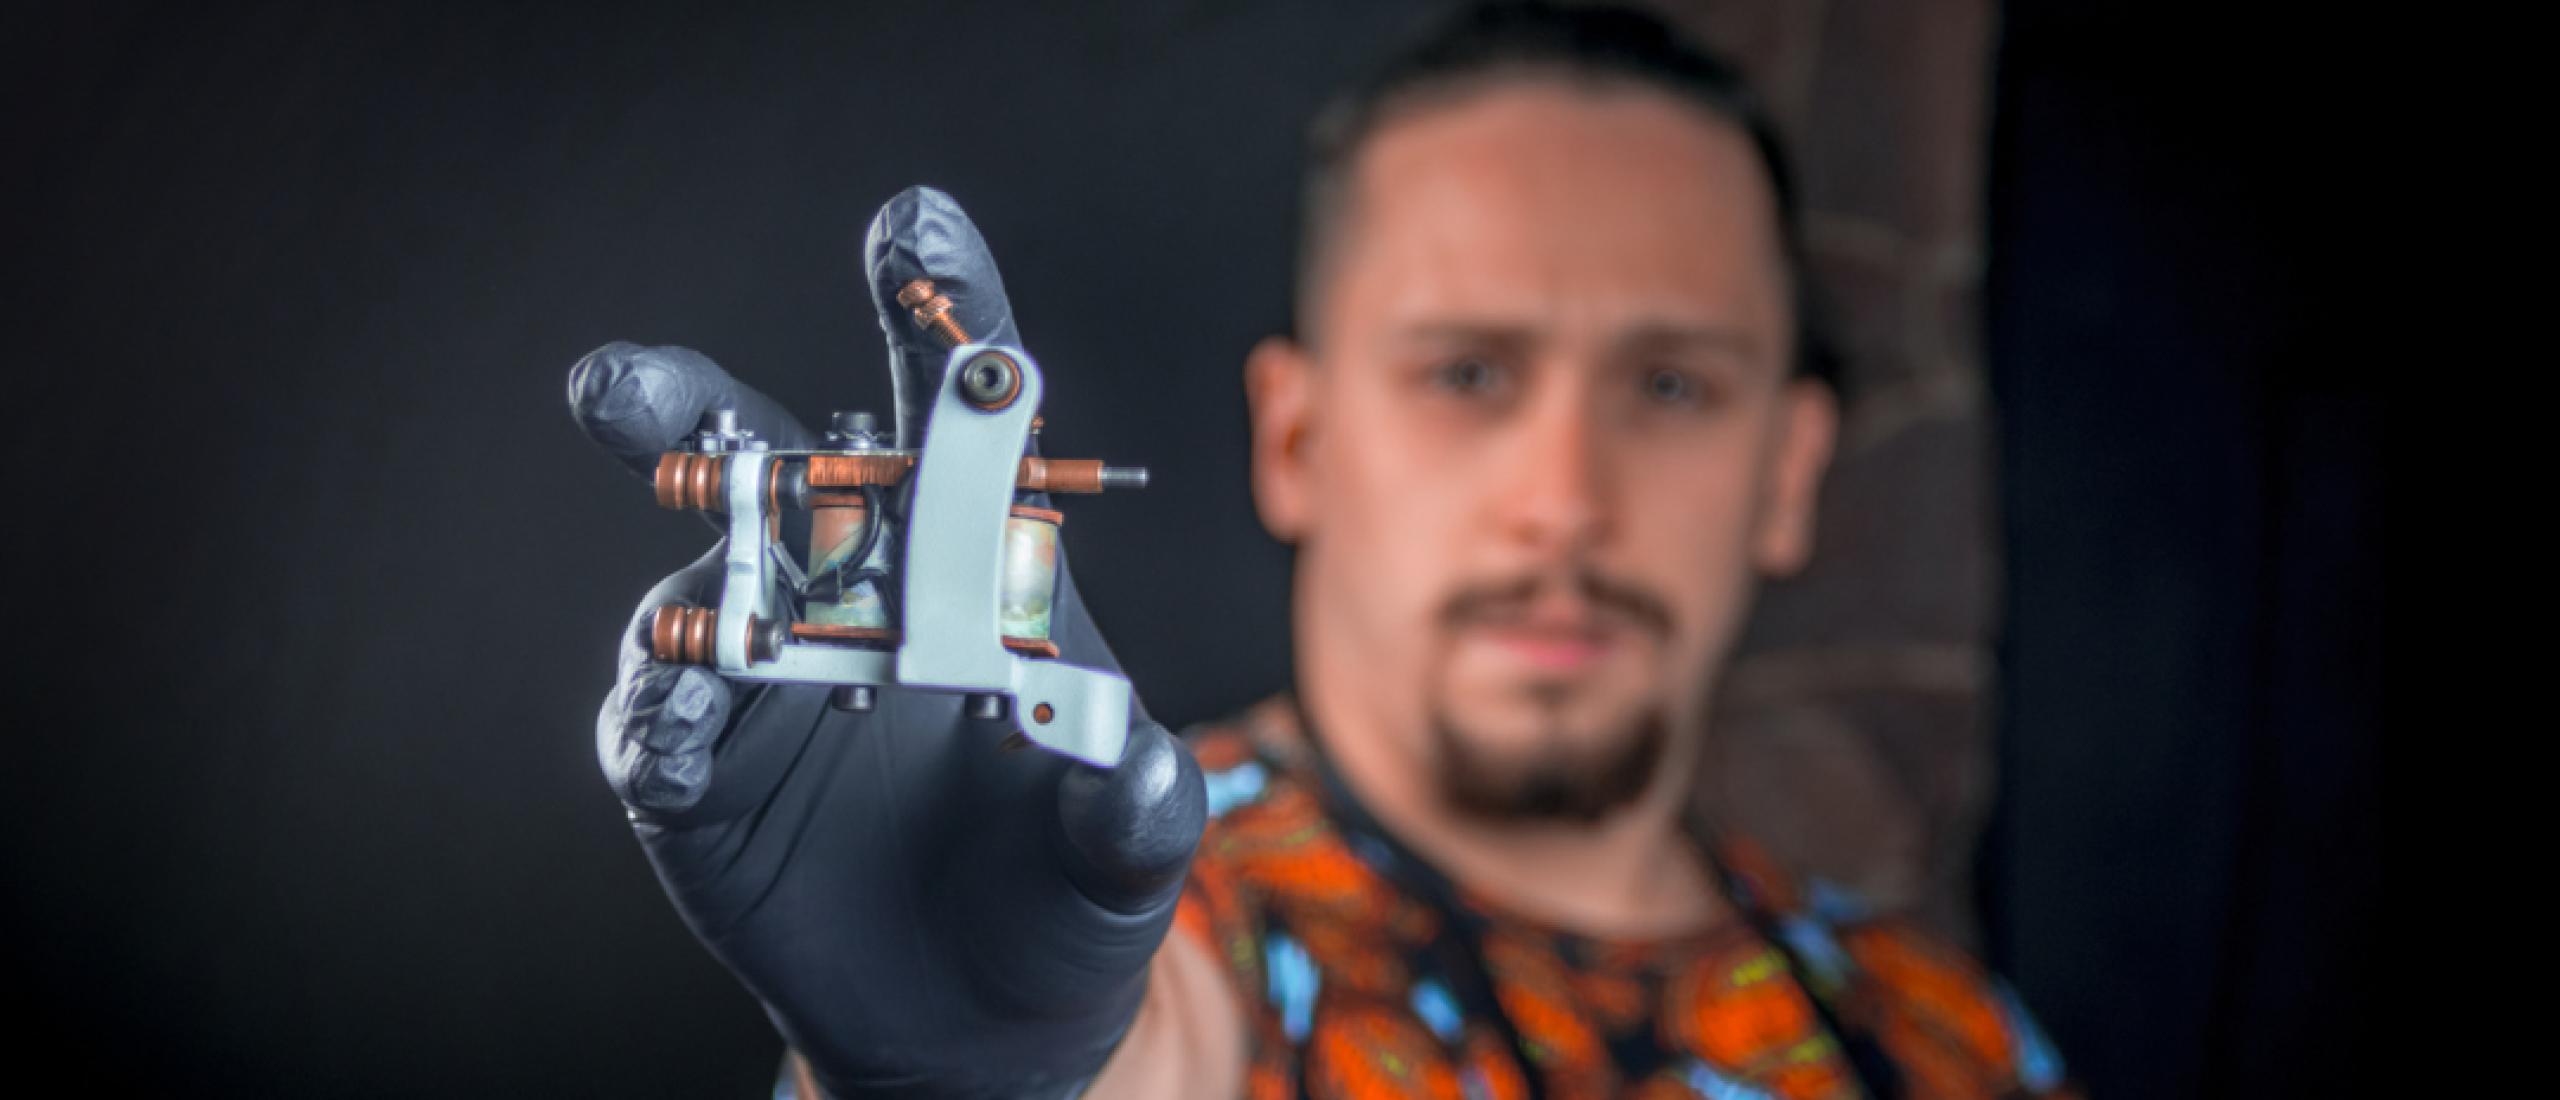 11 online marketing ideeën voor tattooshops